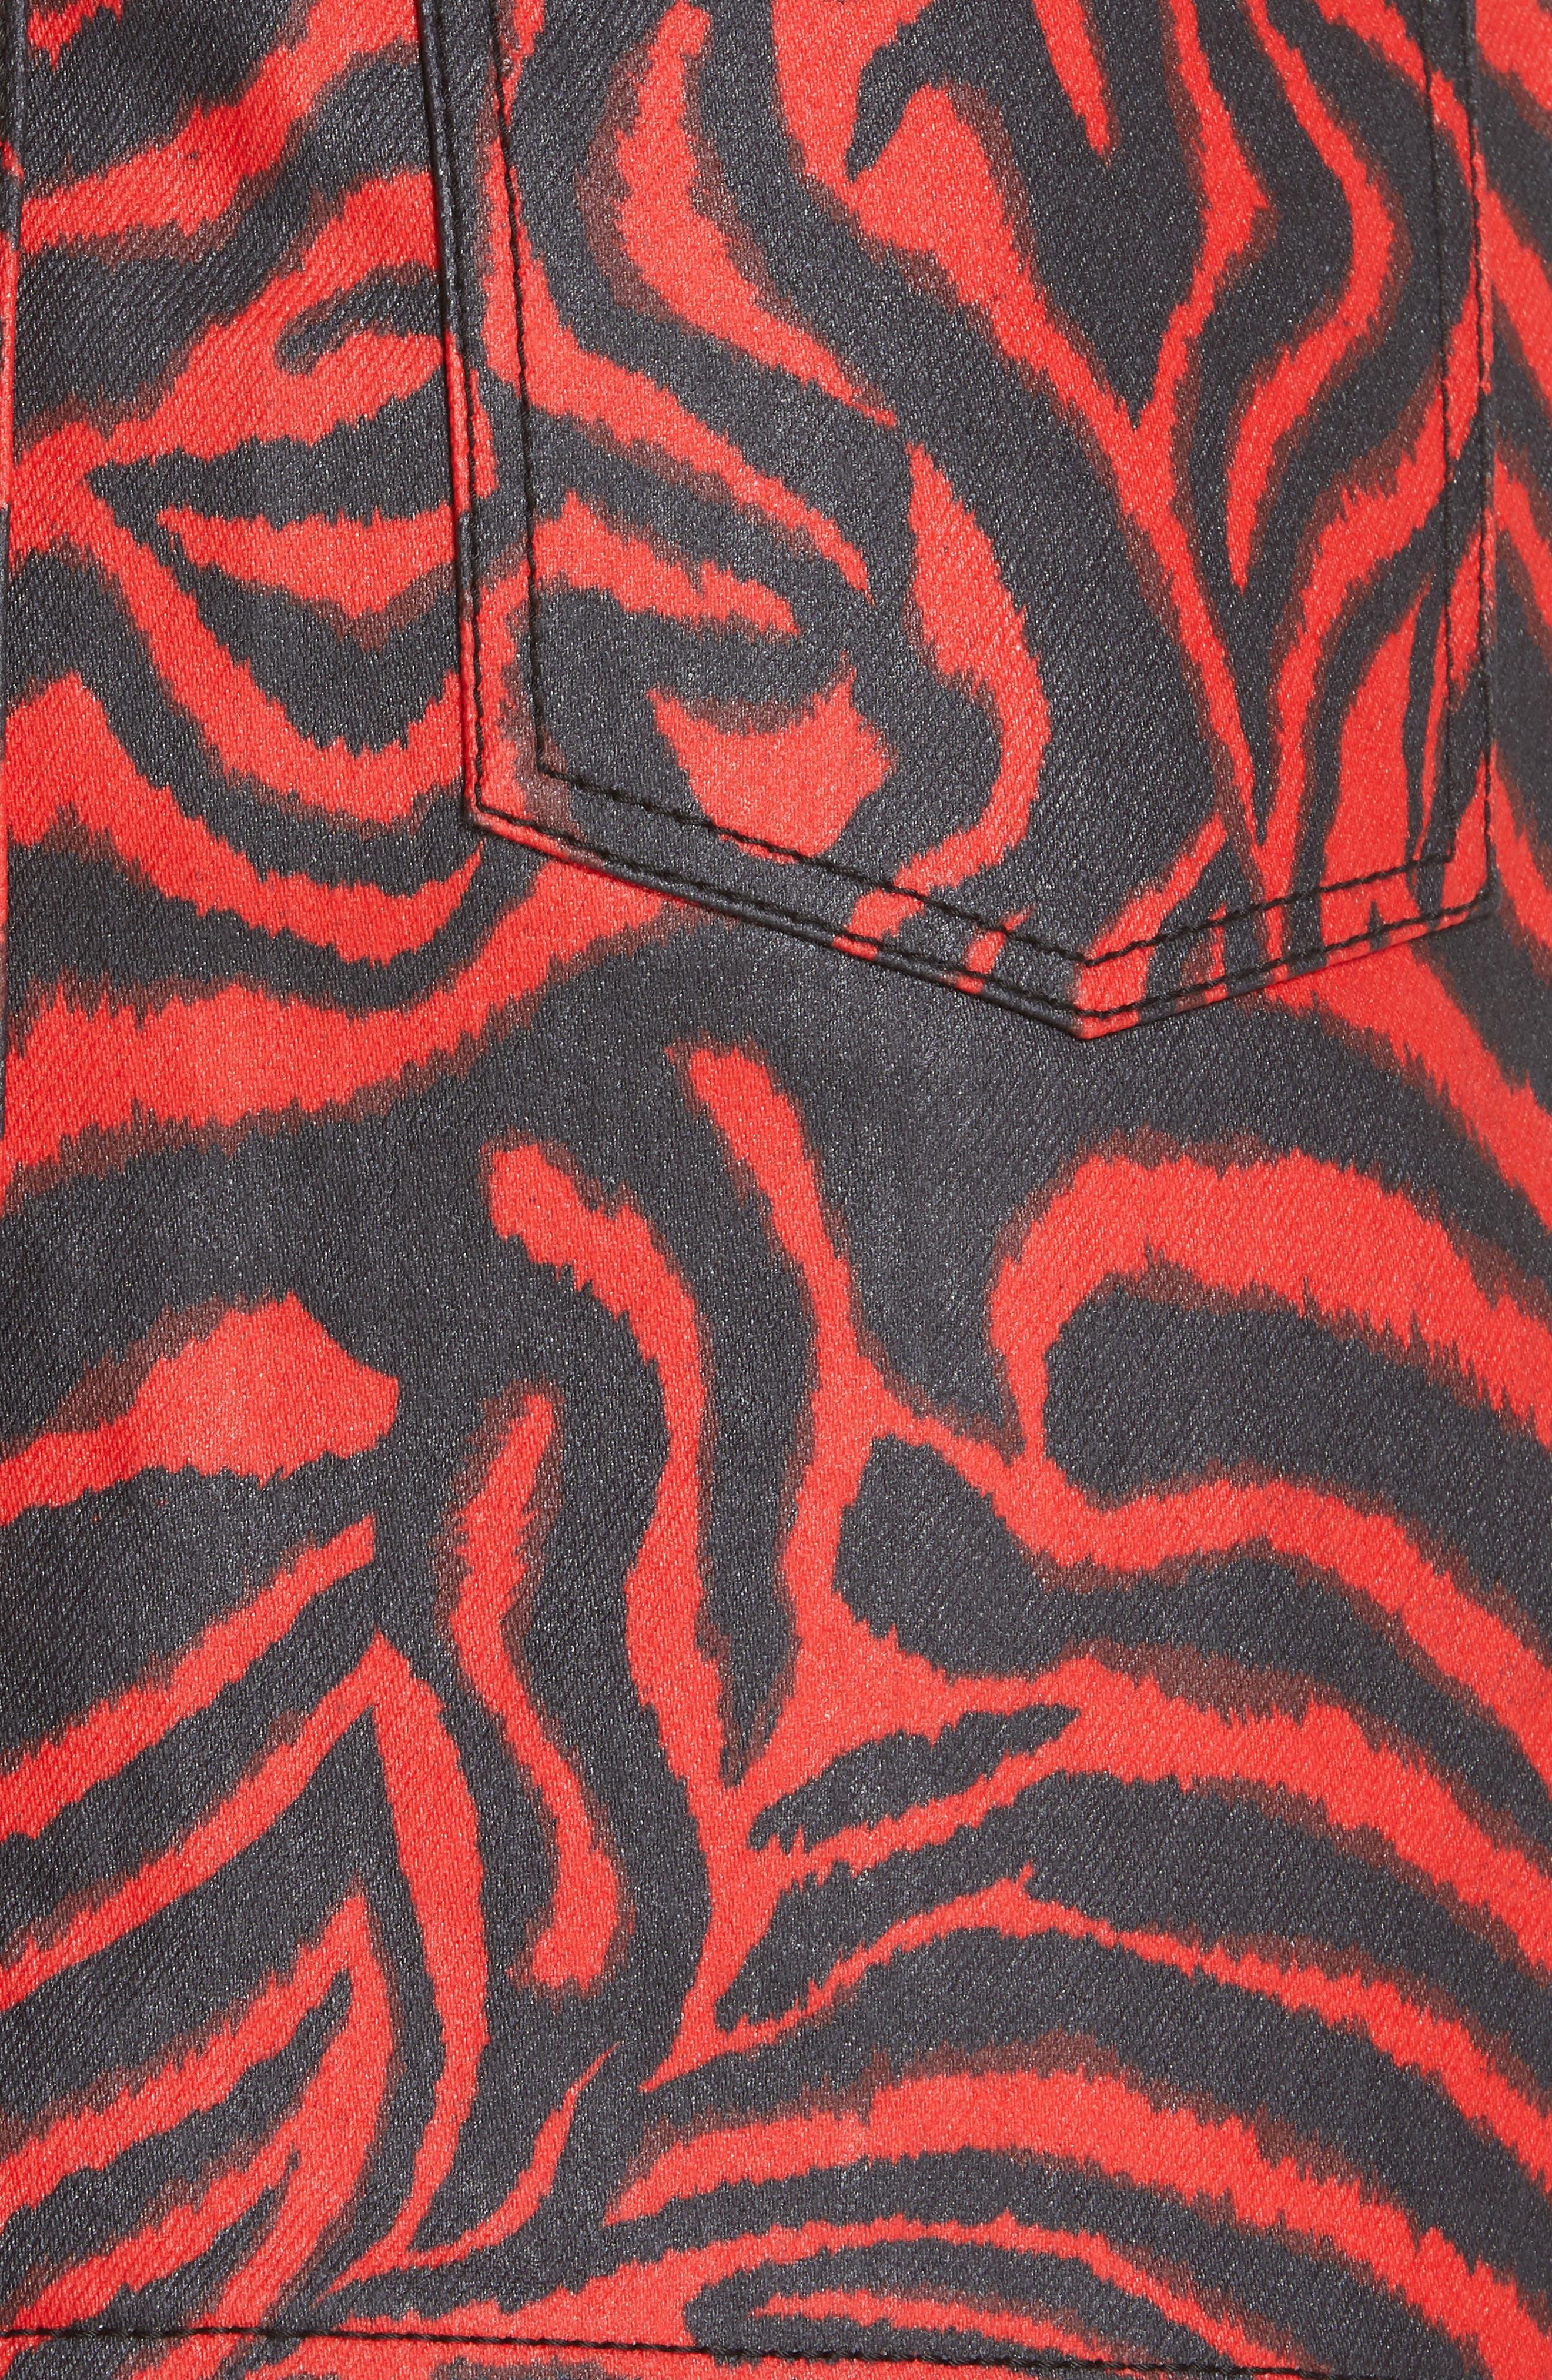 CALVIN KLEIN 205W39NYC, Zebra Print Denim Skirt, Alternate thumbnail 5, color, RED ZEBRA